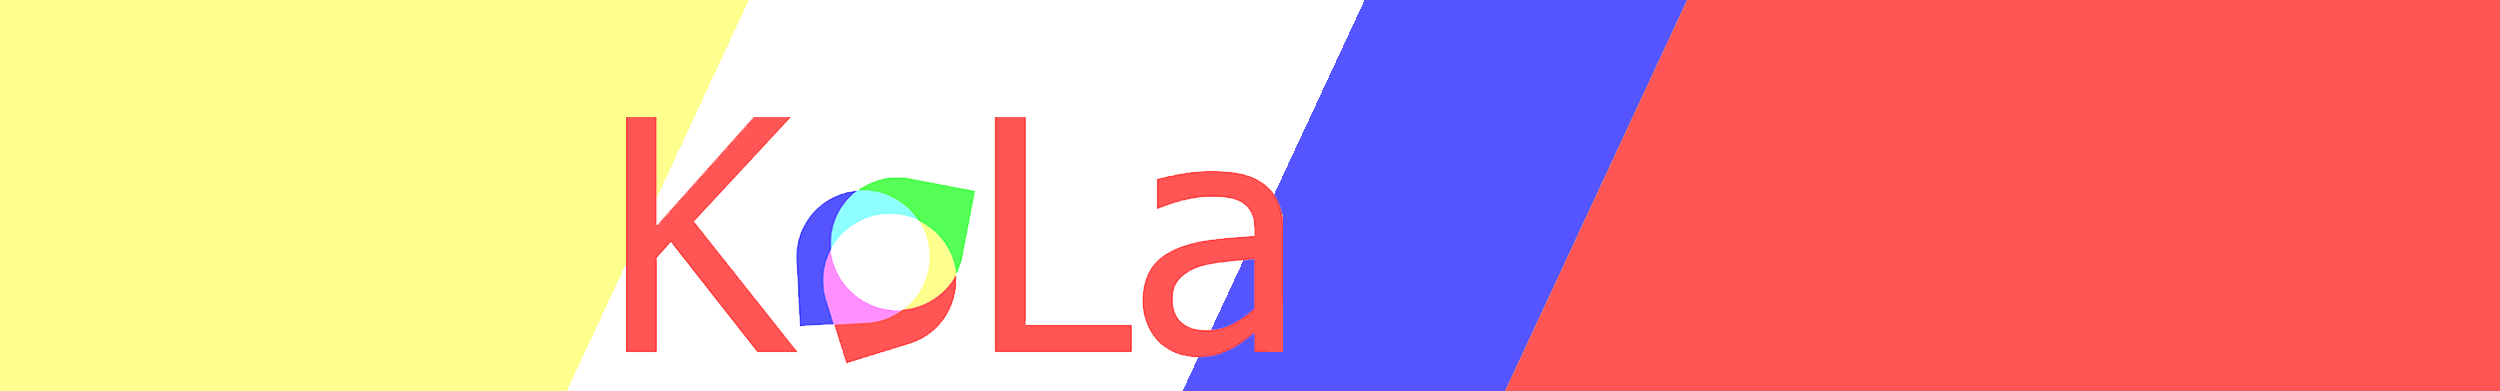 logo KOLA